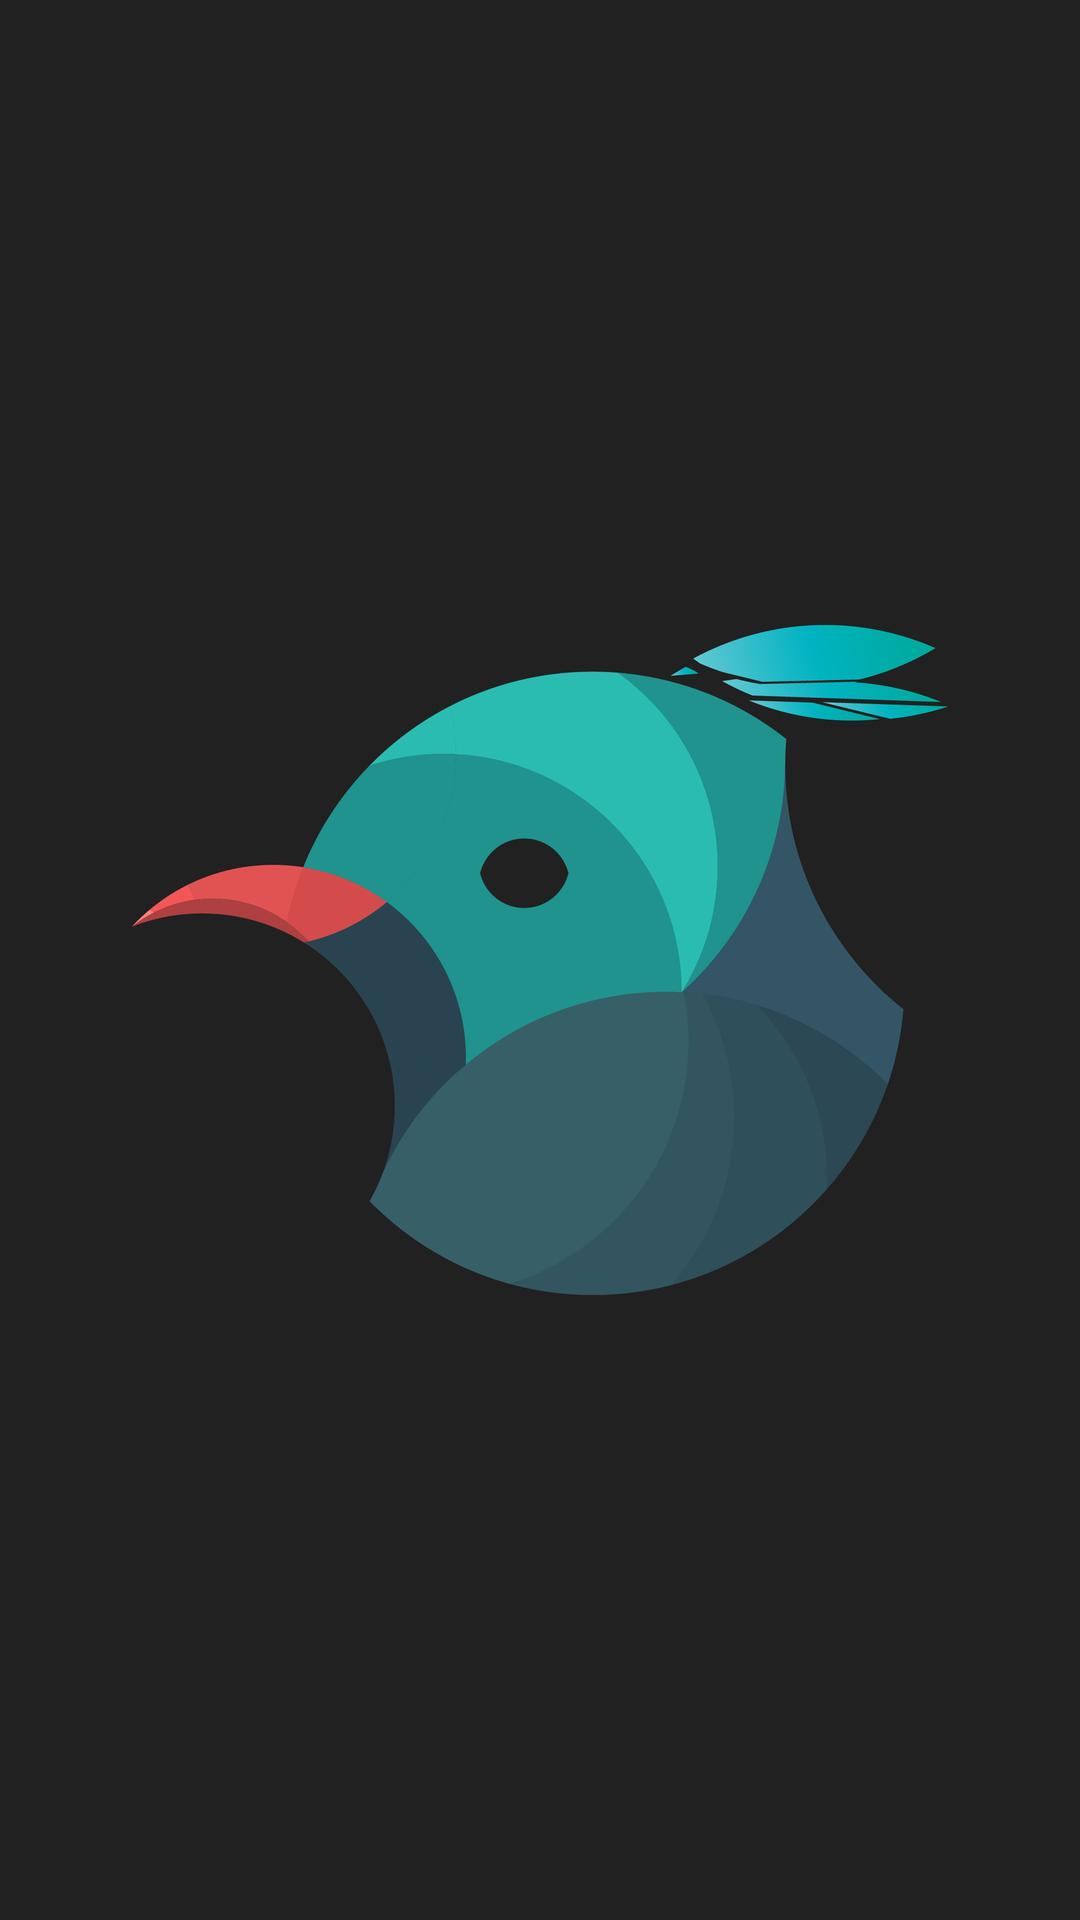 blue-jays-logo-minimalism-4k-3o.jpg